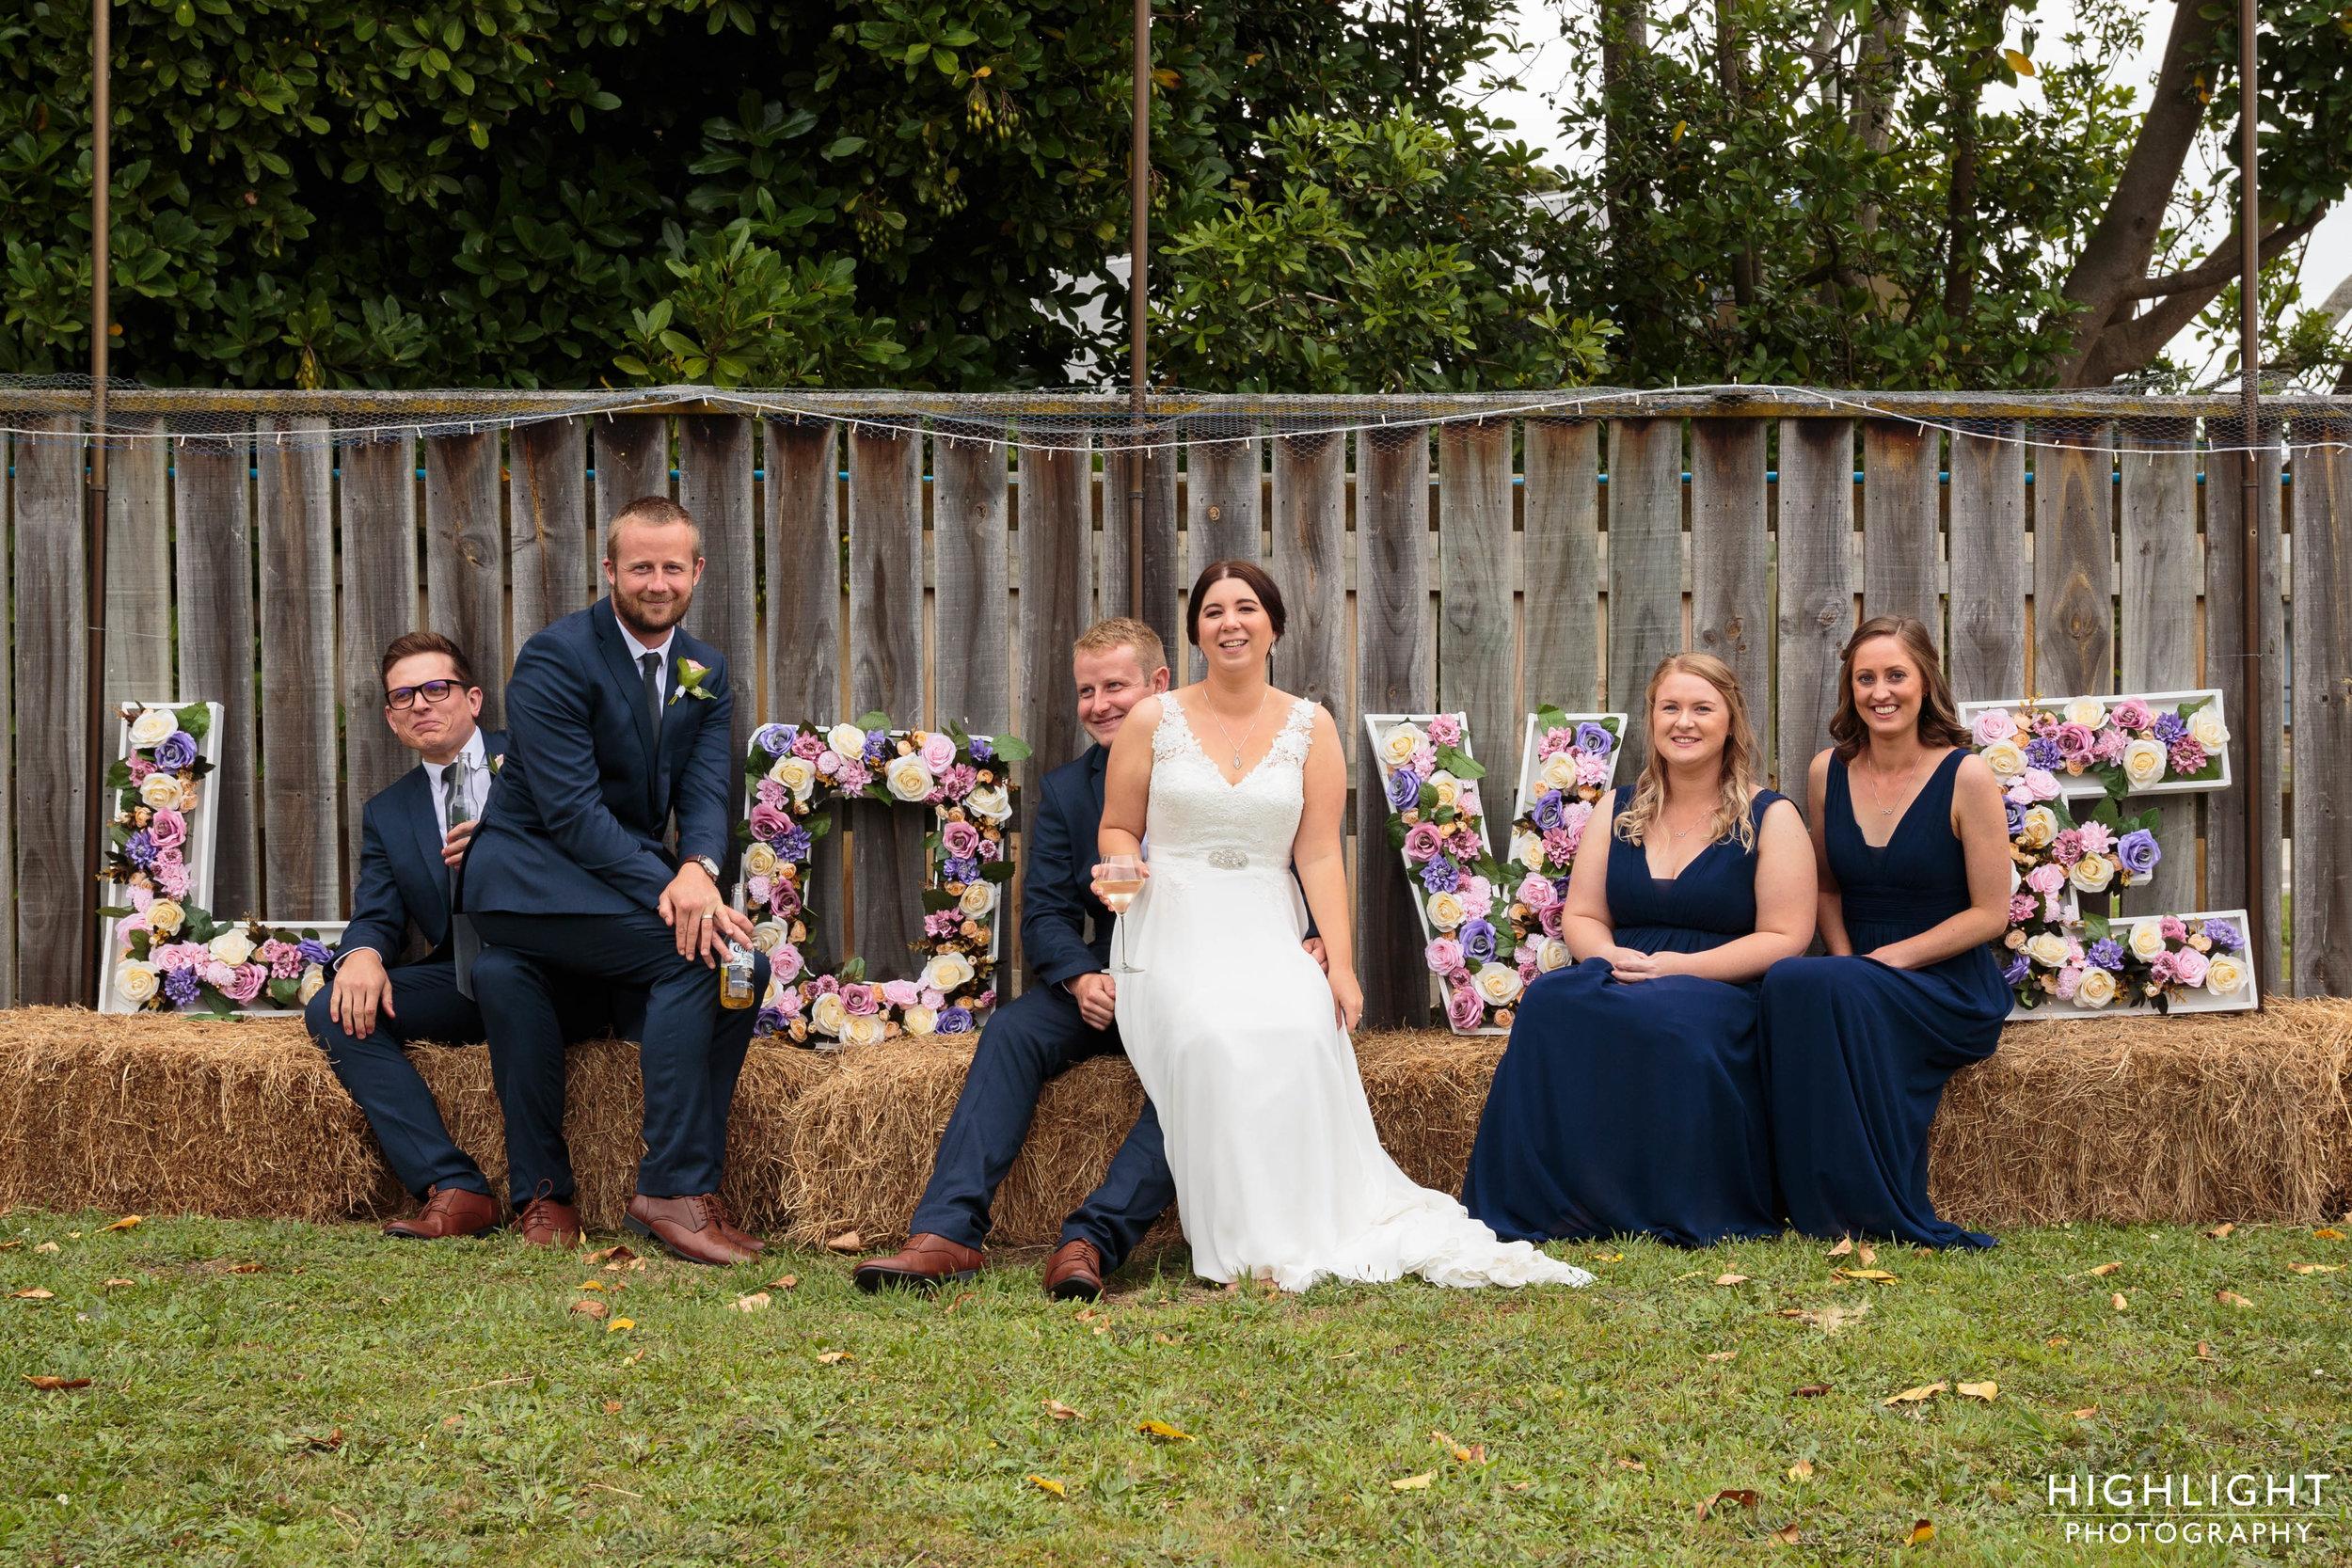 JM-2017-Highlight-wedding-photography-palmerston-north-new-zealand-158.jpg